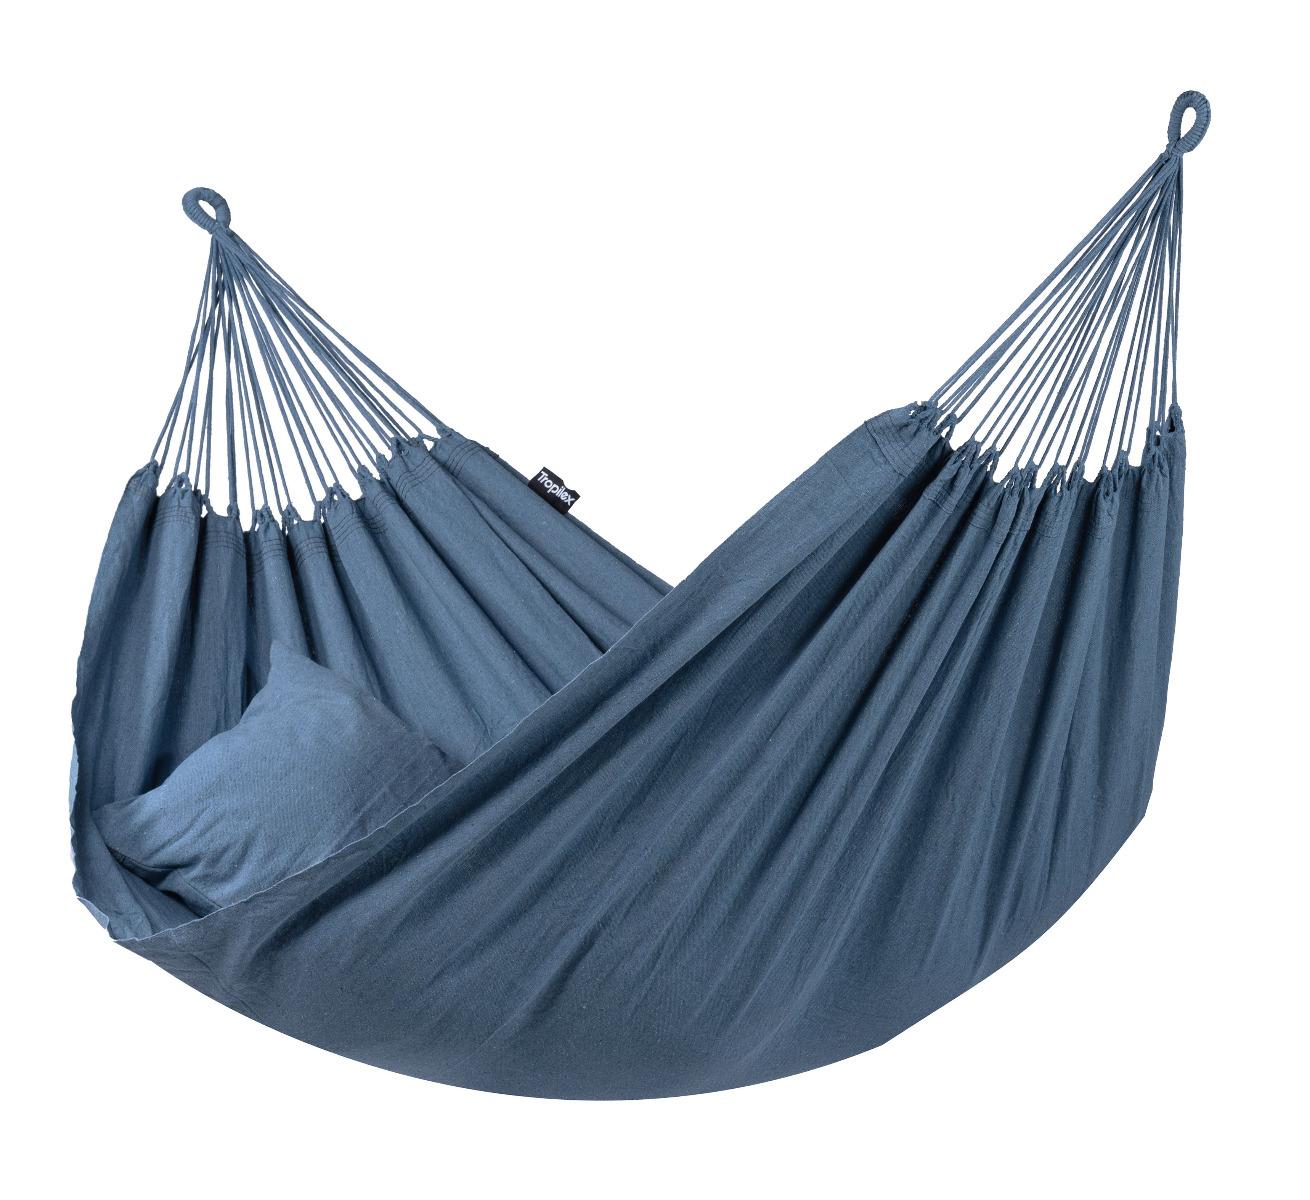 'Plain' Jeans E�npersoons Hangmat - Blauw - Tropilex �